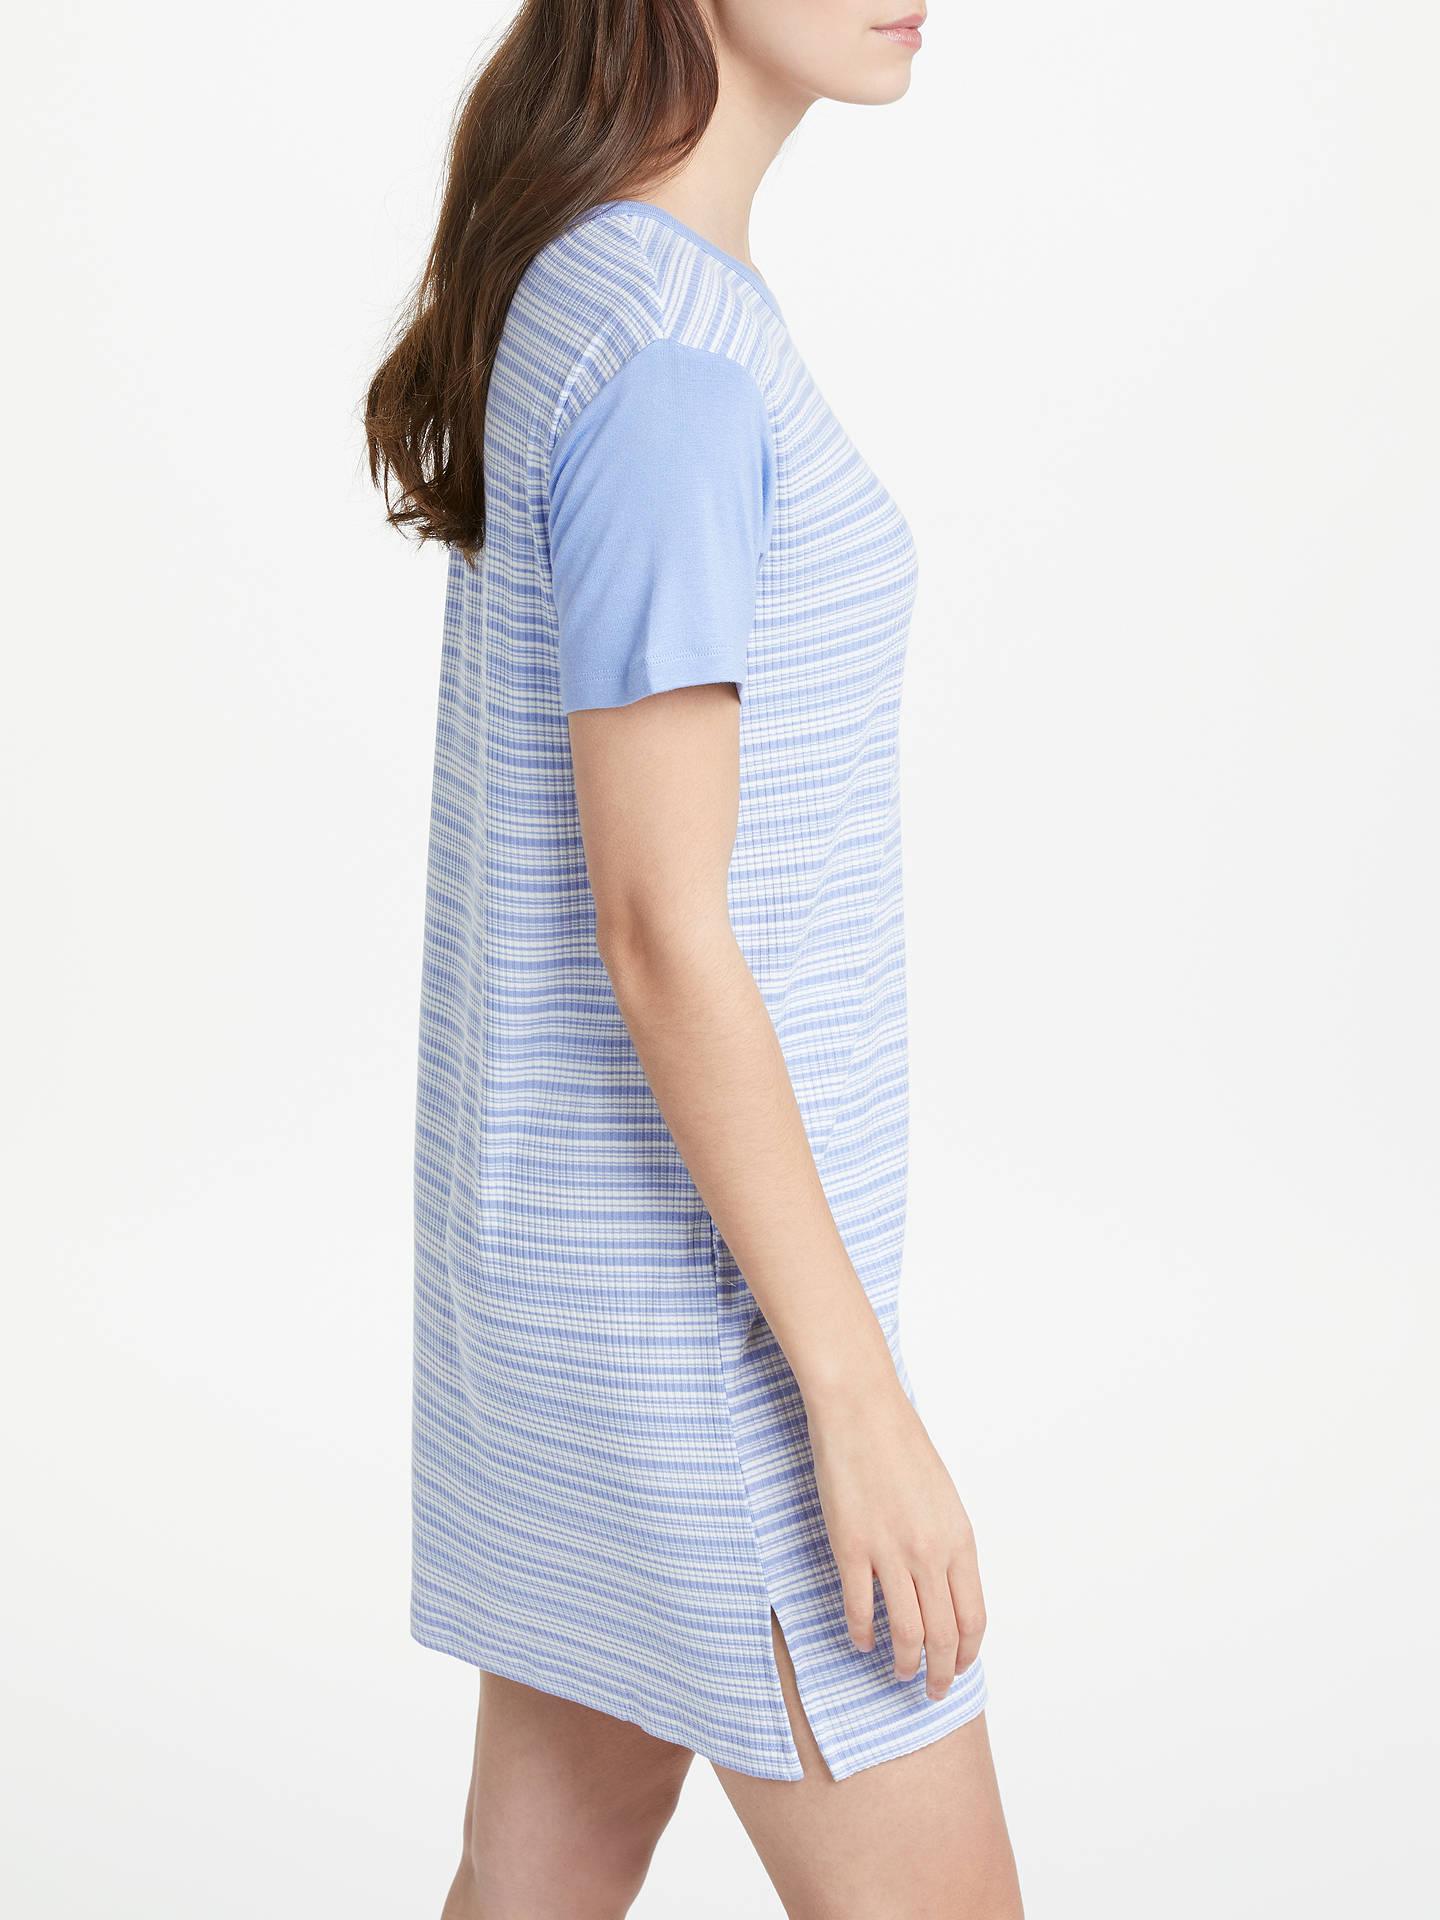 ... BuyDKNY City Chic Stripe Nightdress 78069c659